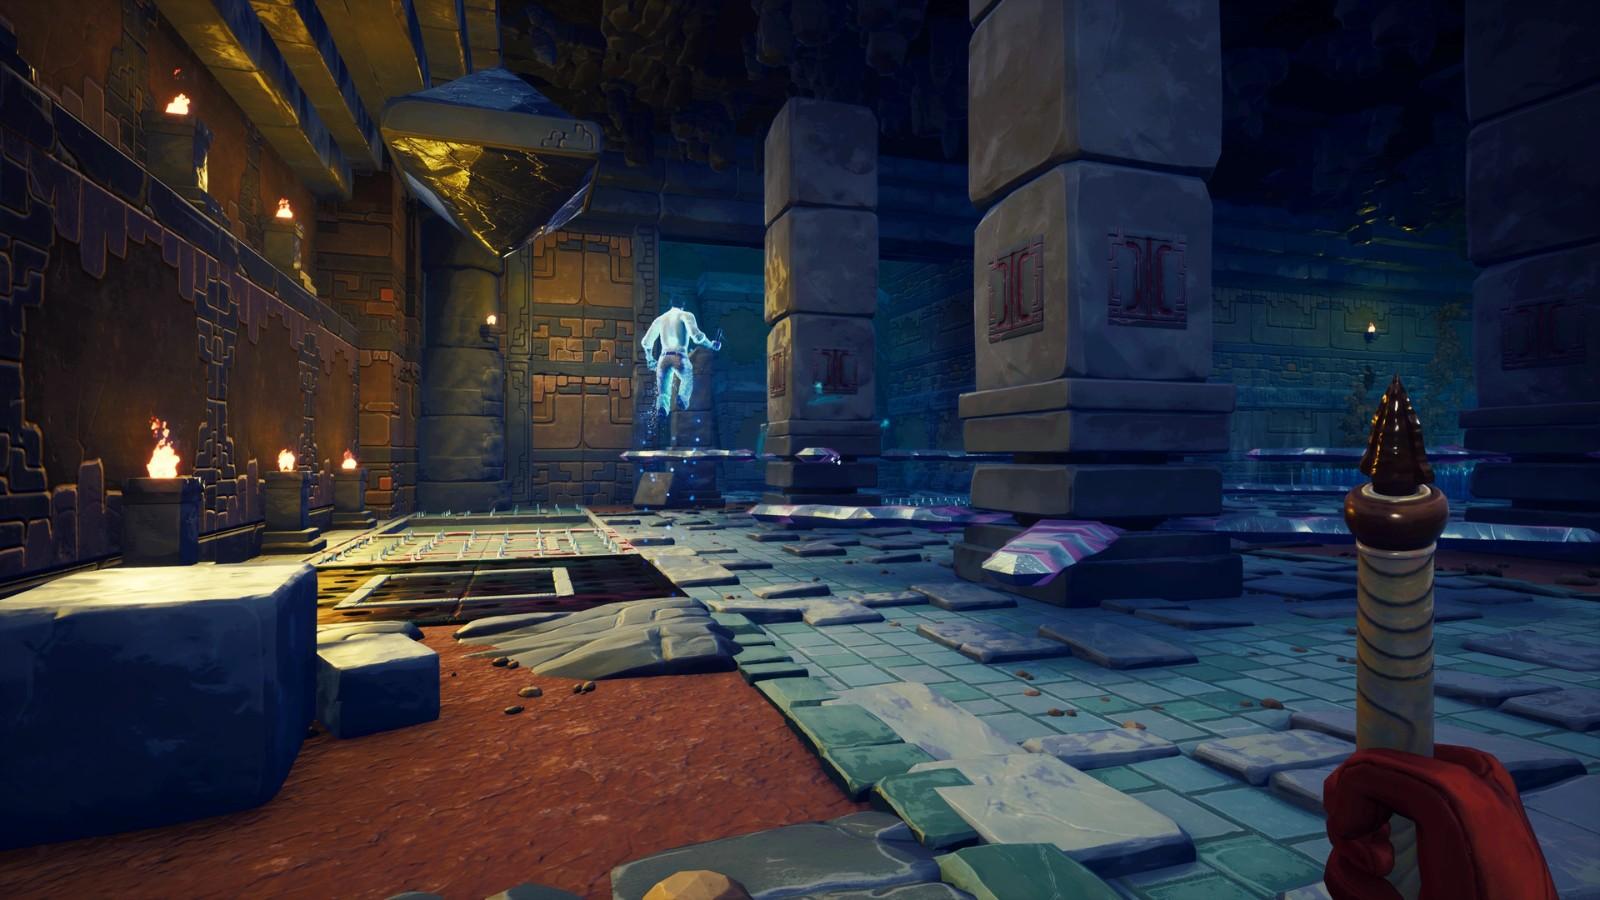 E3 2021:《幻影深渊》新实机预告 6月23日登Steam抢先体验